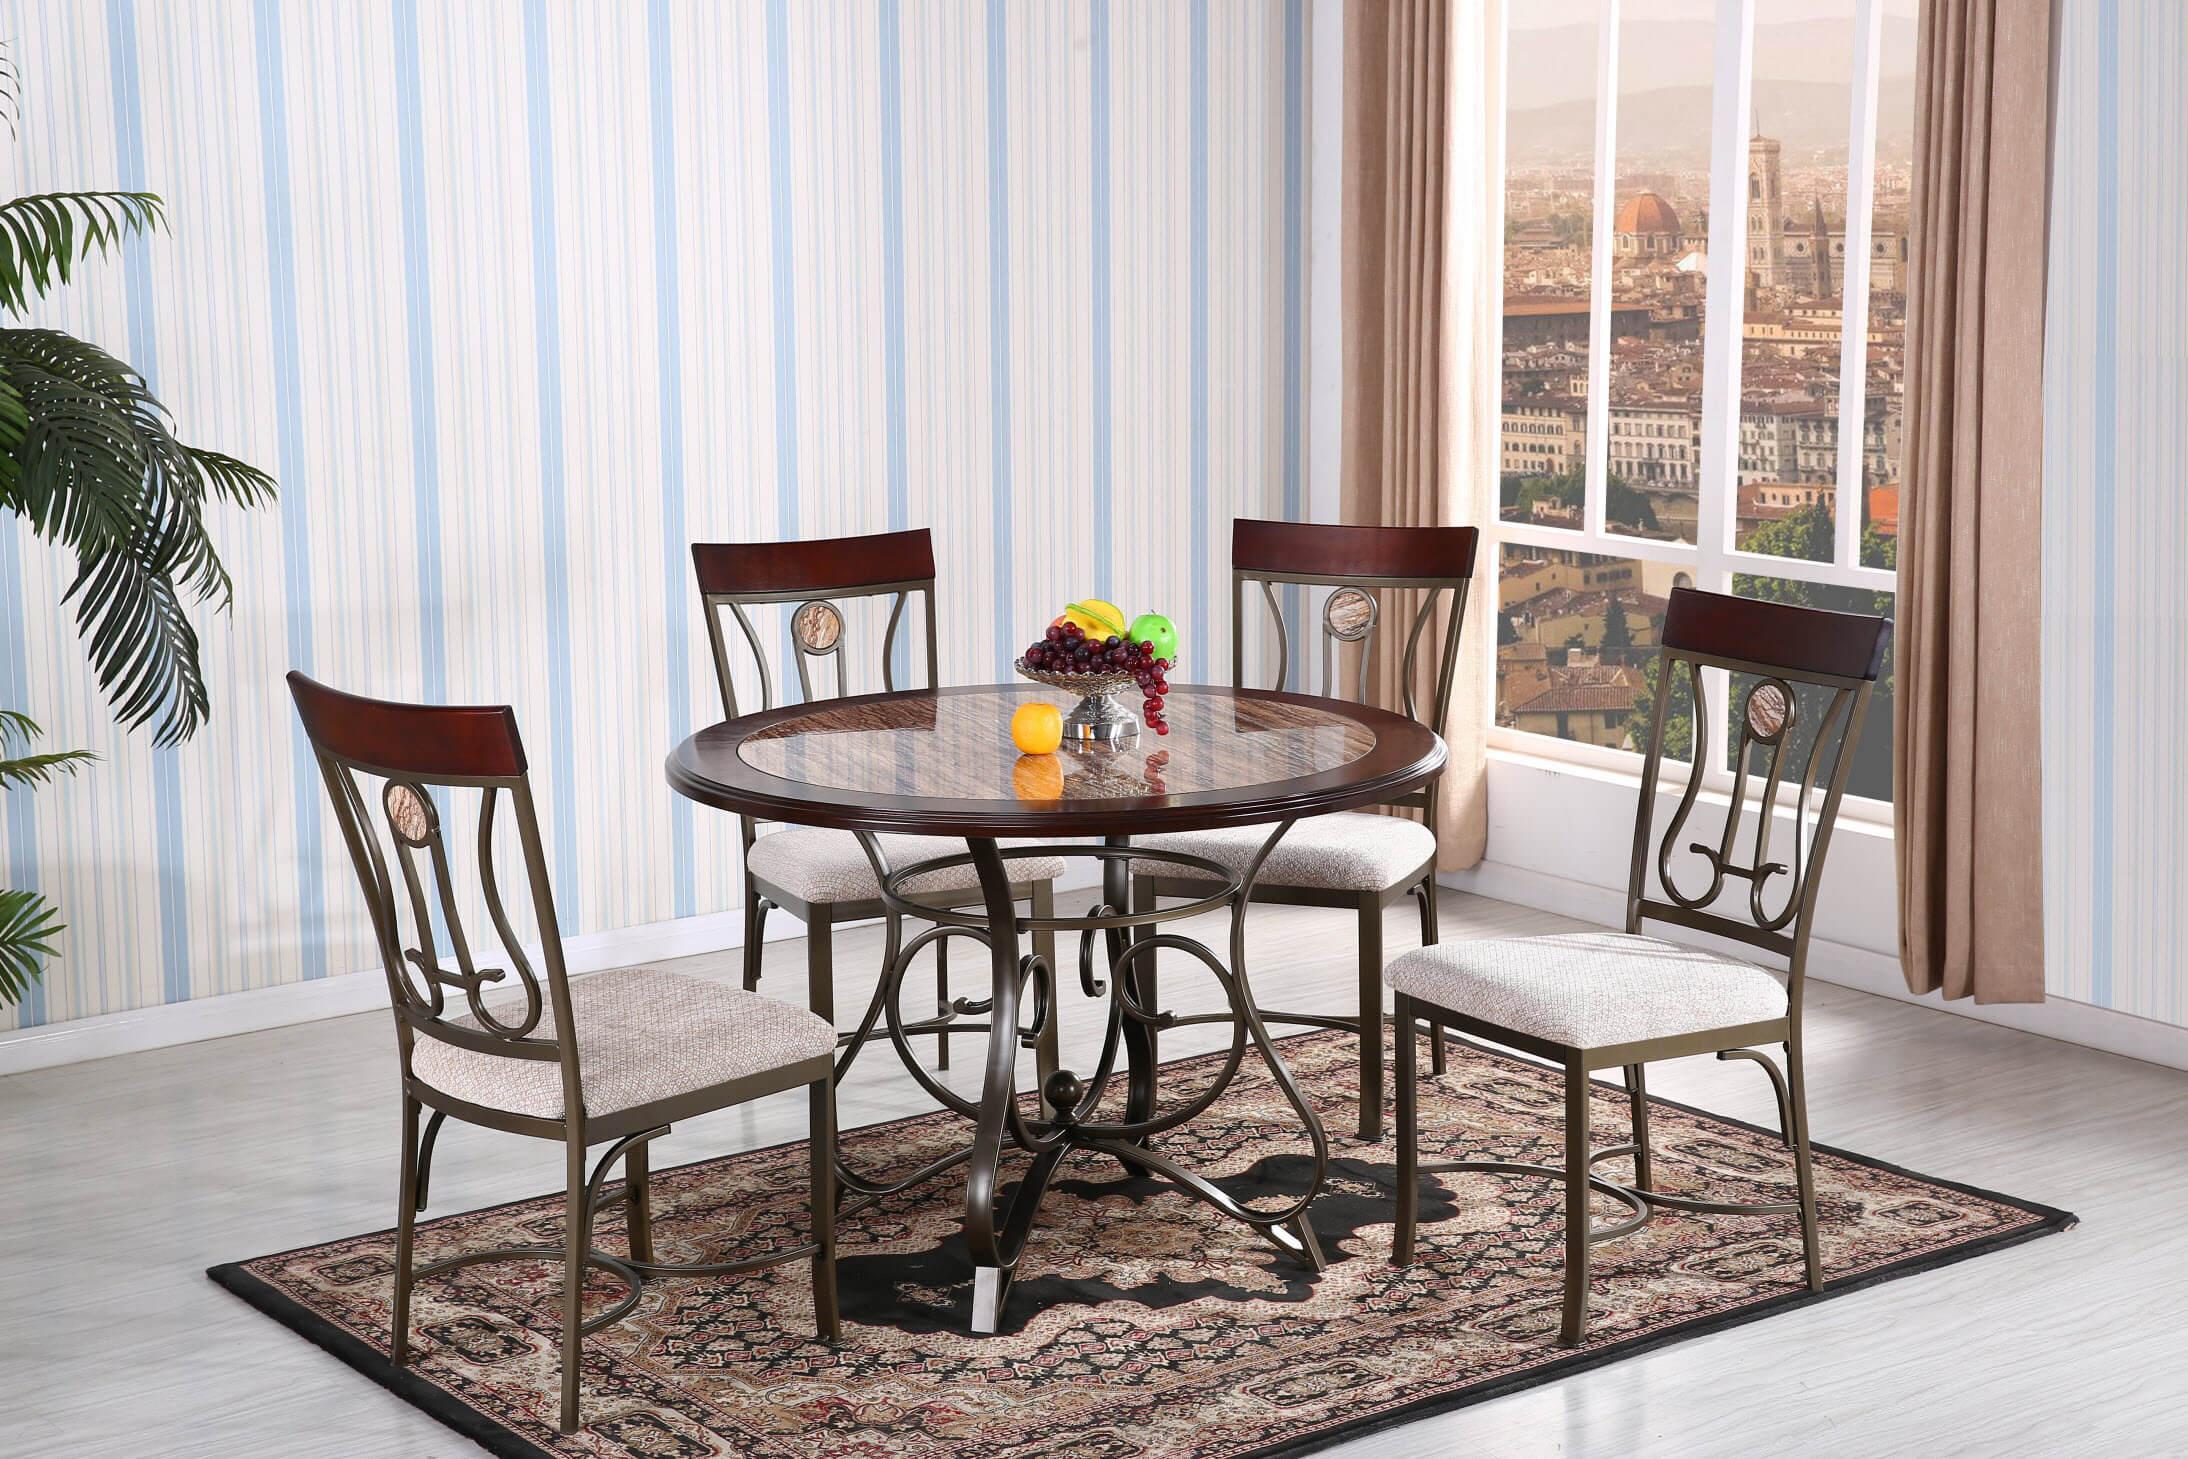 Travertine Dining Set Dining Room Furniture Sets